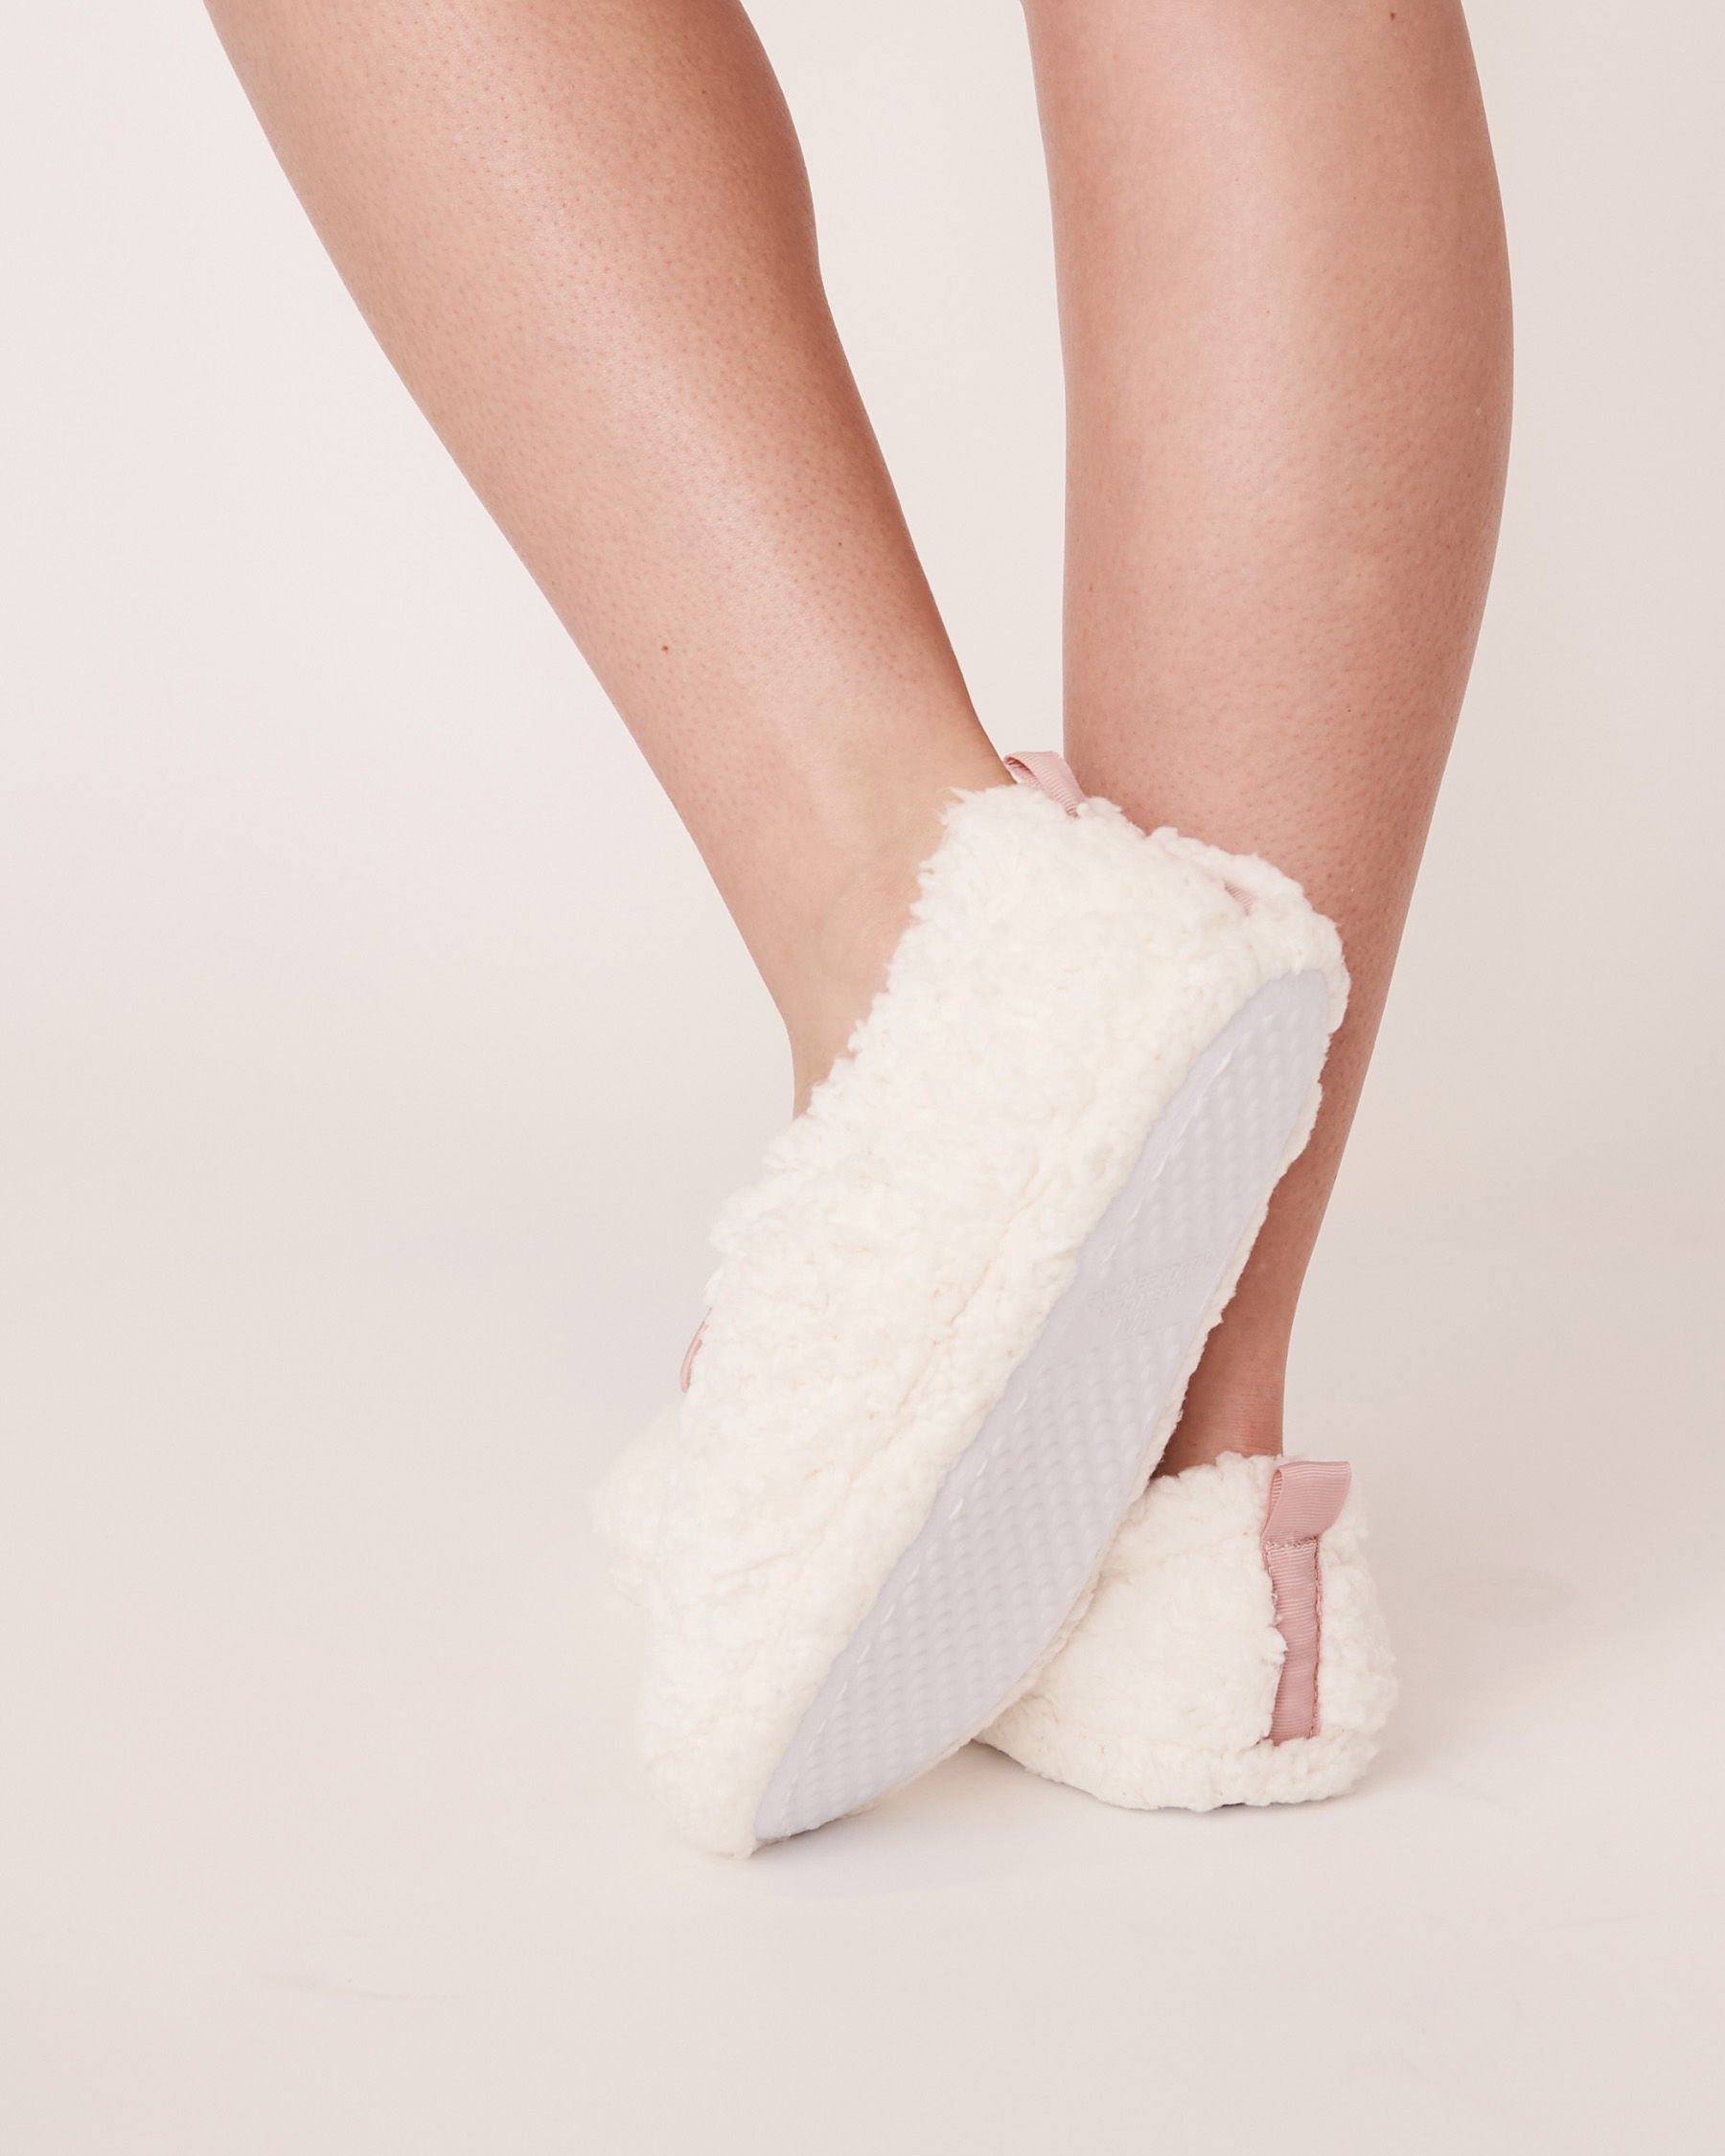 LA VIE EN ROSE Sherpa Bootie Slippers White 40700070 - View2